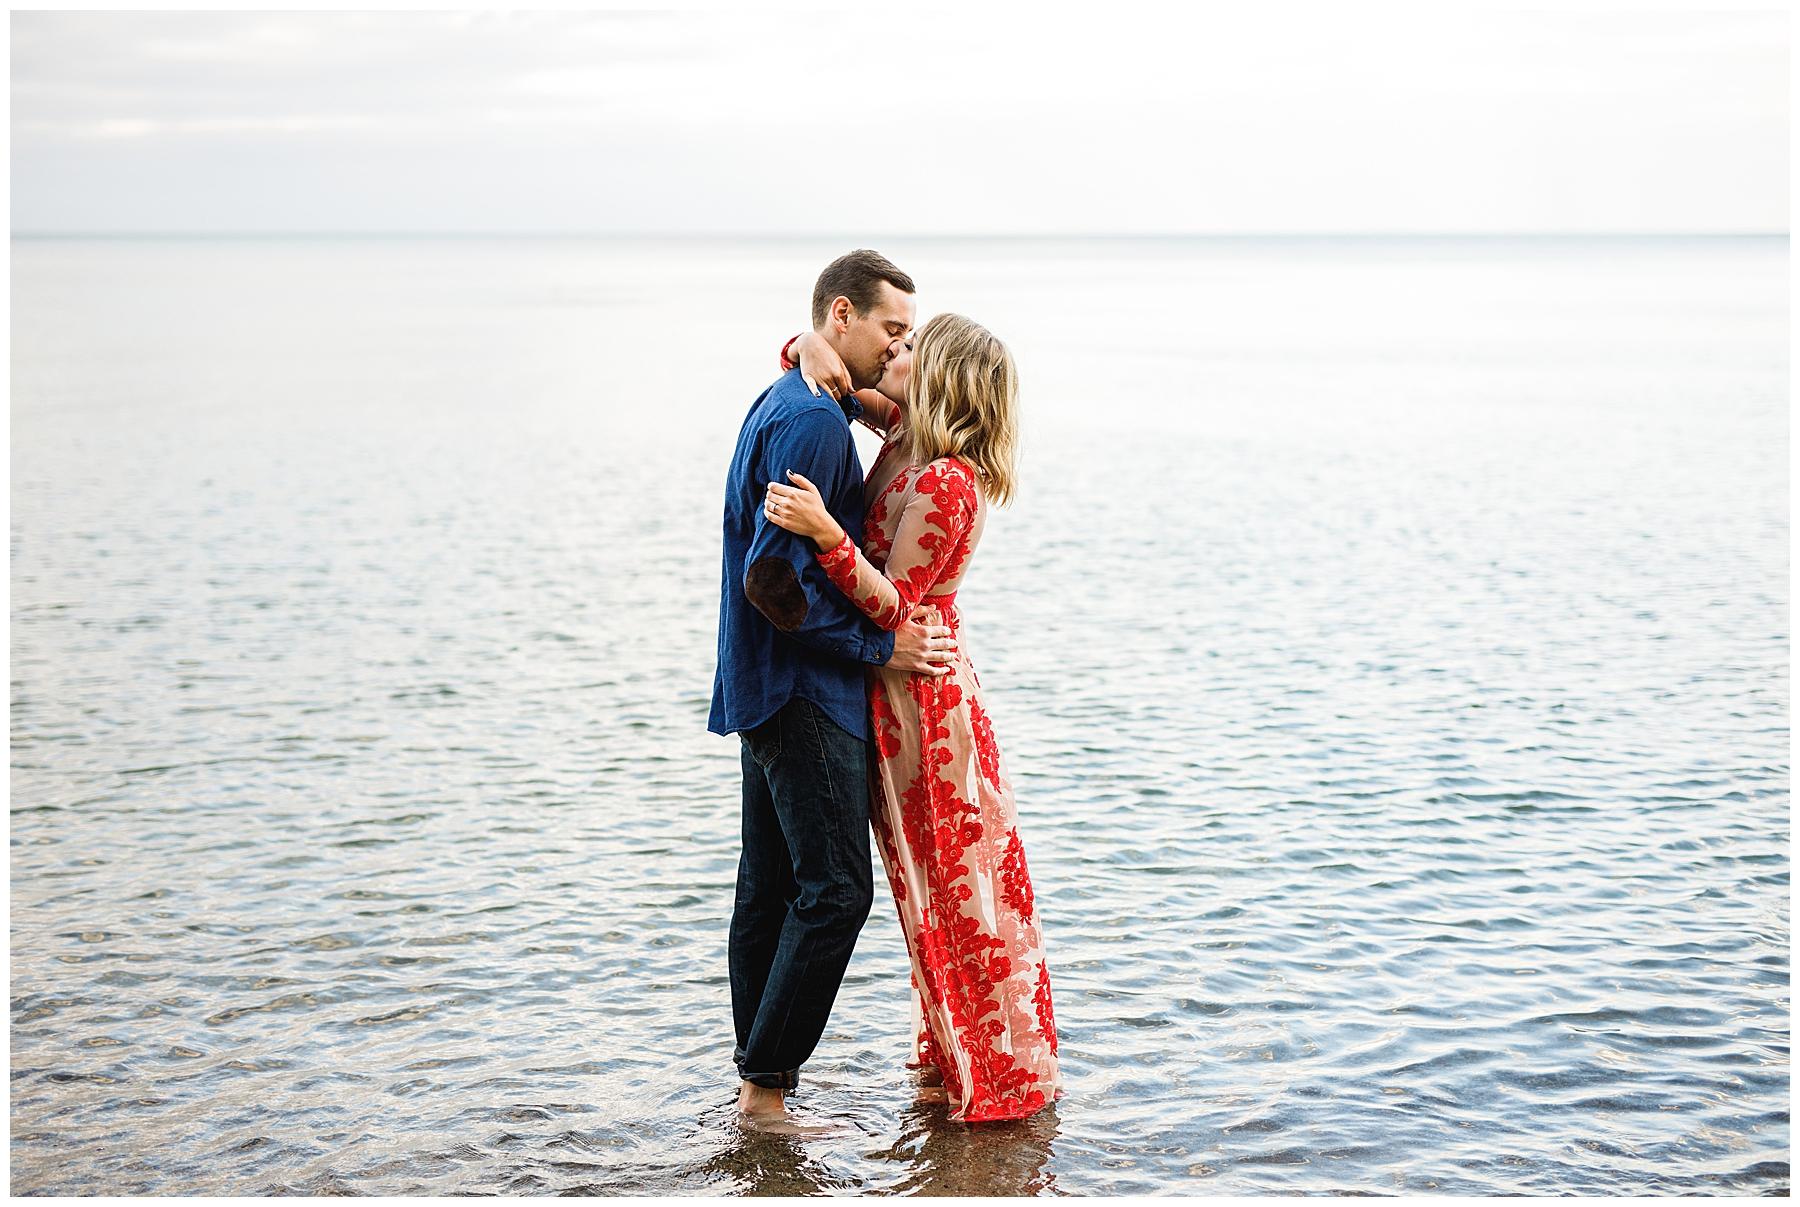 Lake Michigan Engagement Session Milwaukee Red Dress - Chelsea Matson Photography